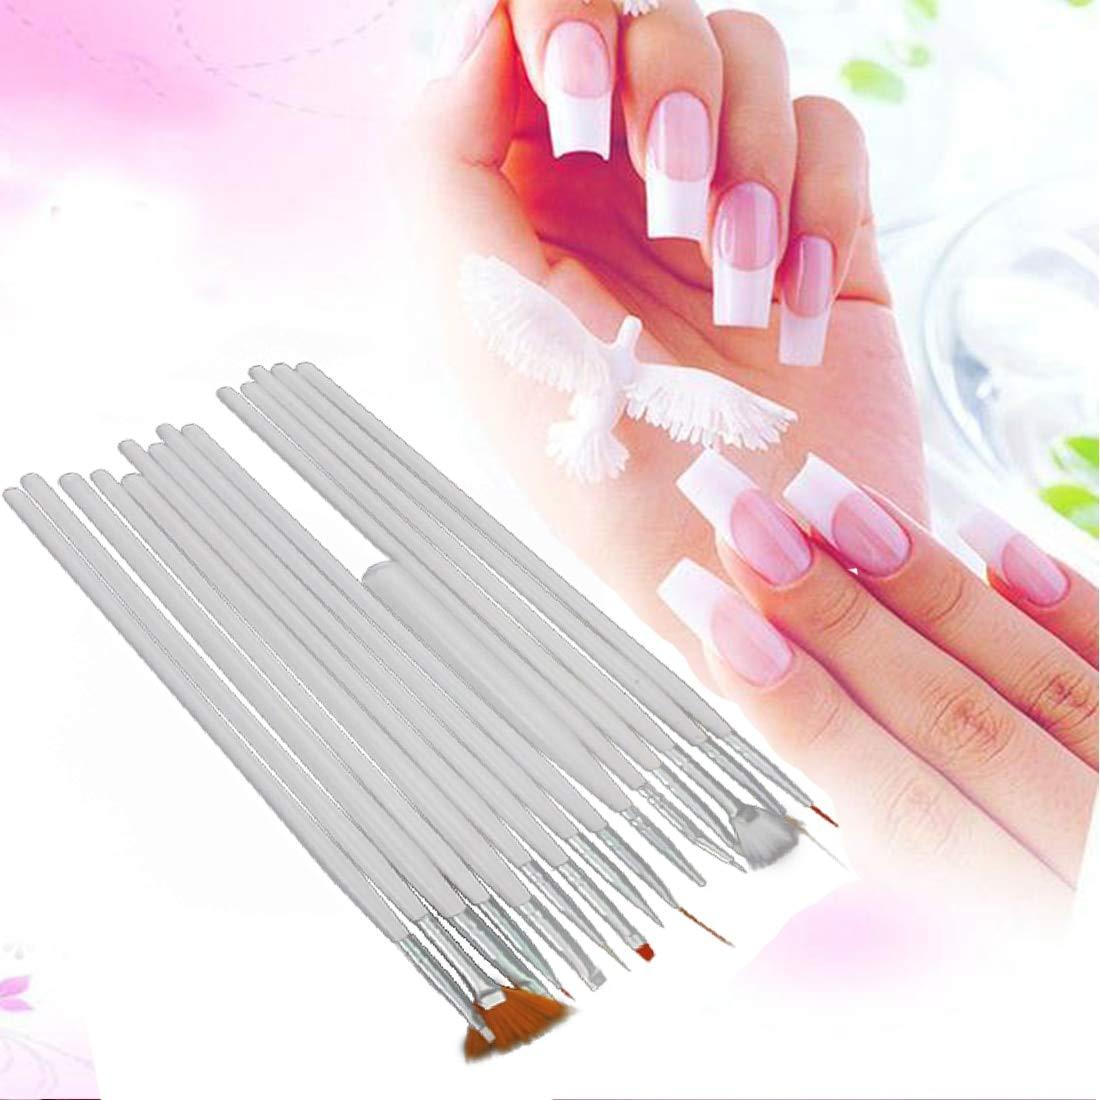 Buy Genuine 15pcs White Nail Brush Painting Pen Design Tool Set Nail Art Uv Gel Nail Polish For Diy Salon Manicure Nail Gel Polish Draw Tool Online At Low Prices In India